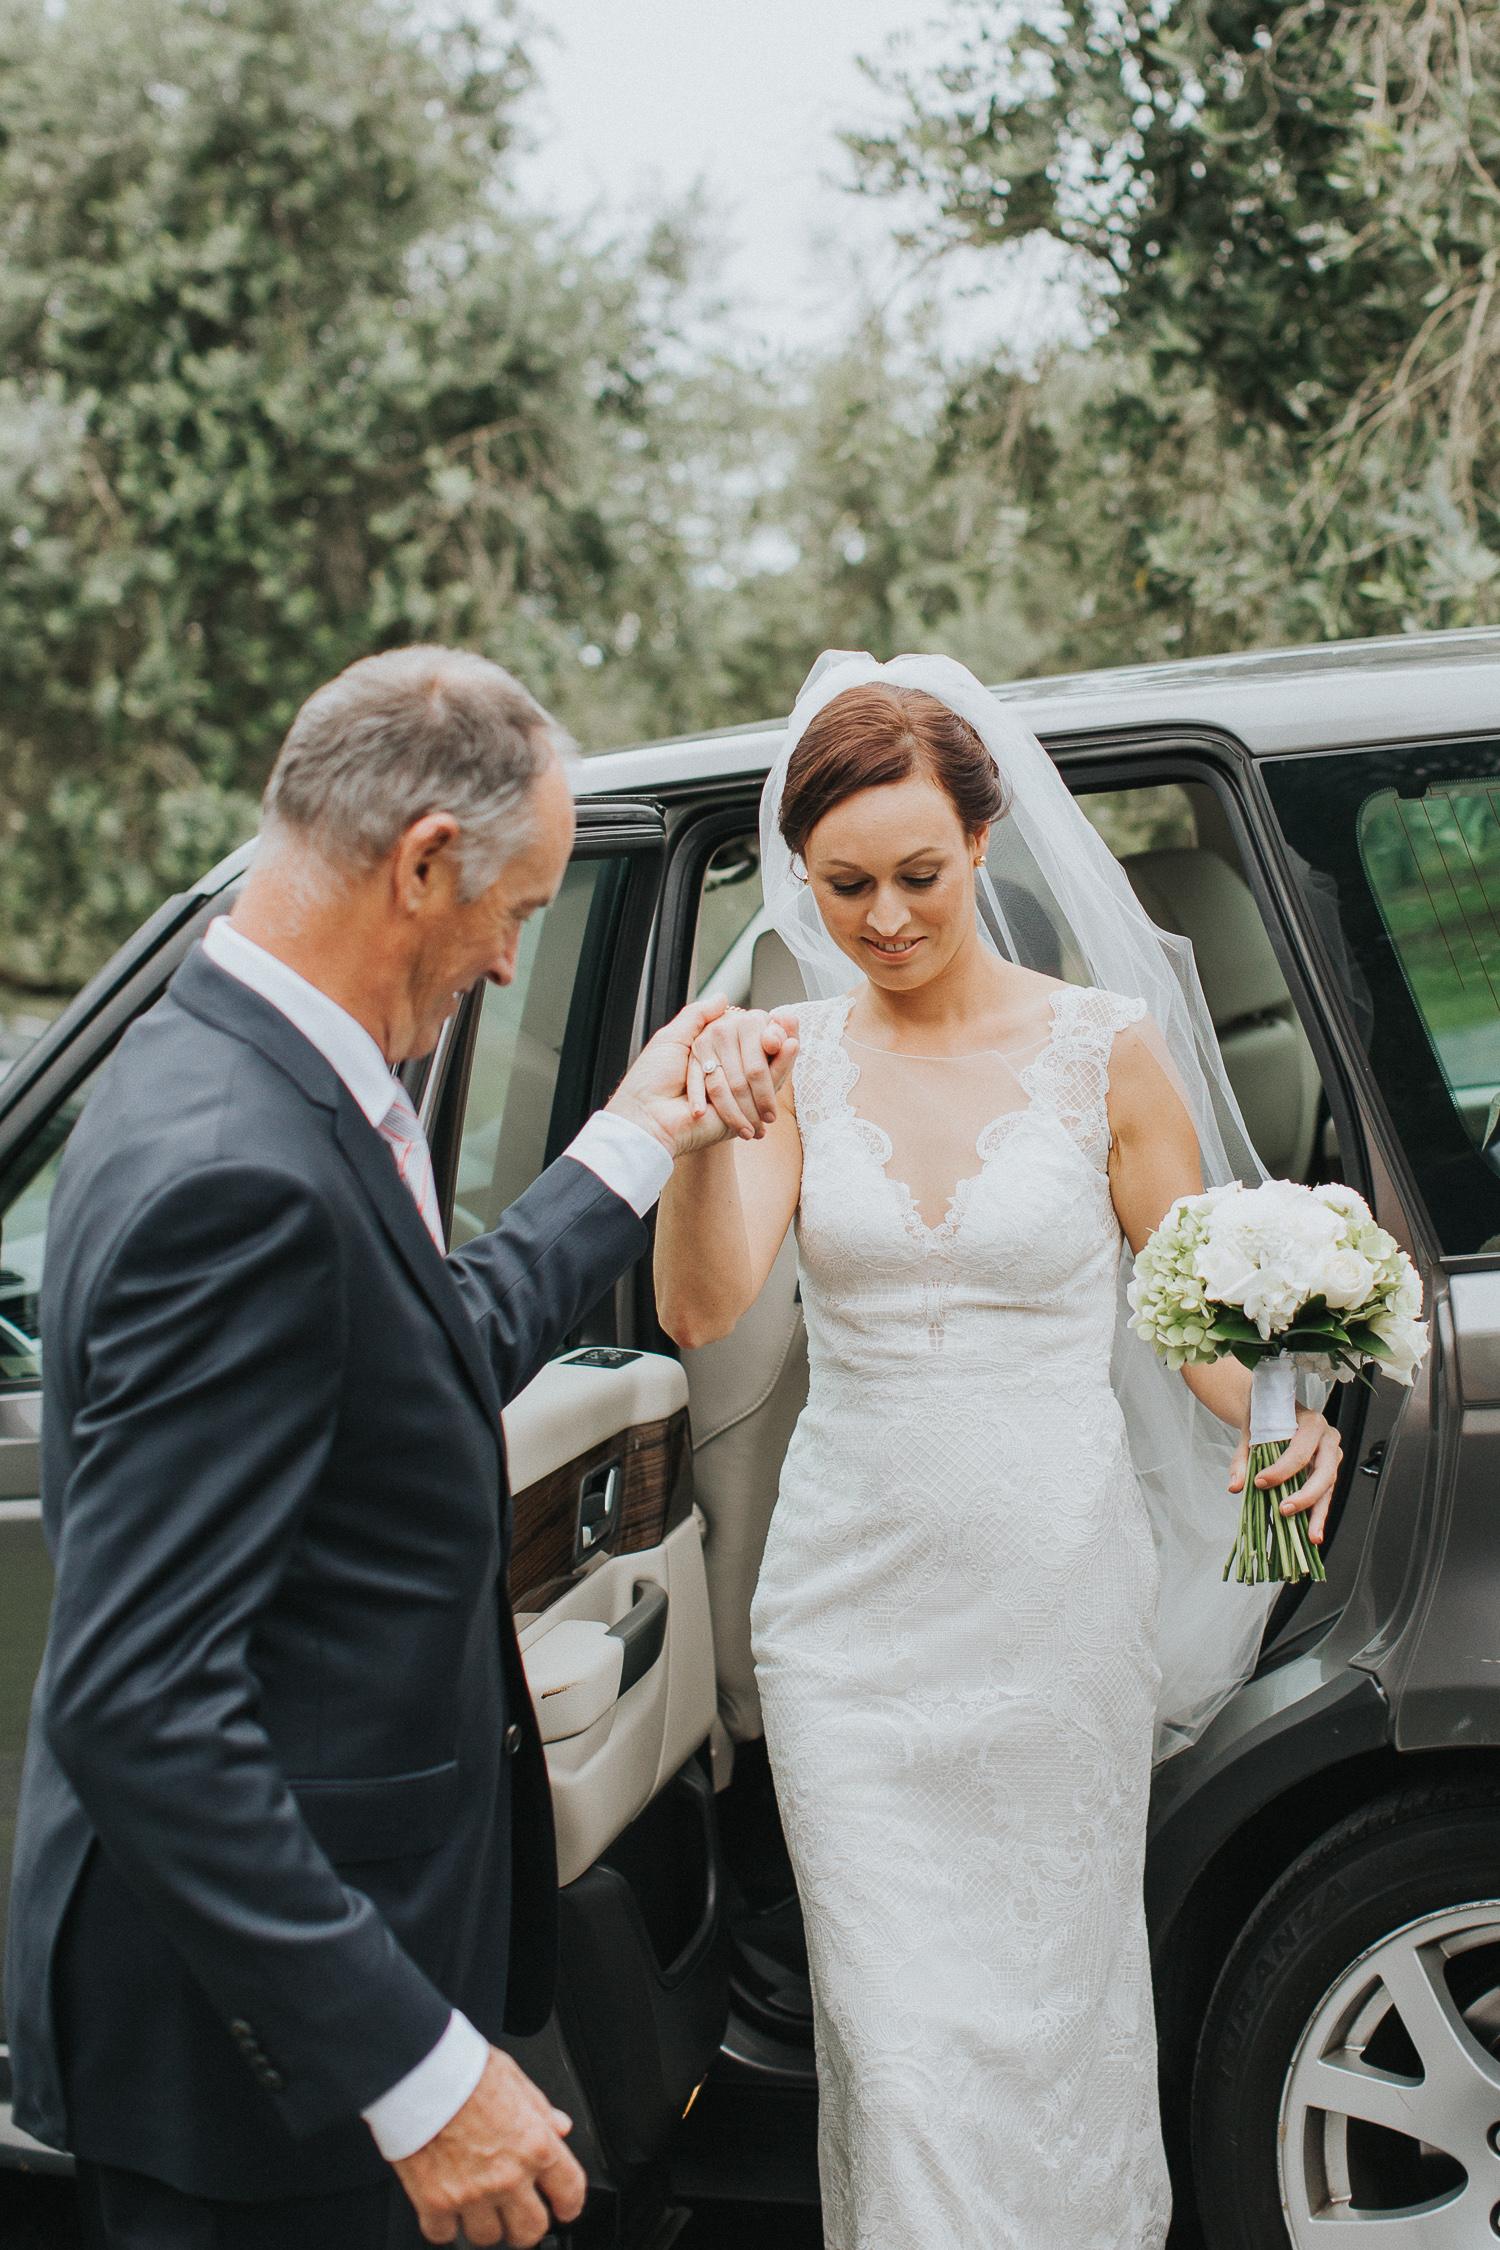 LIZ ANDREW BRACU WEDDING058.JPG